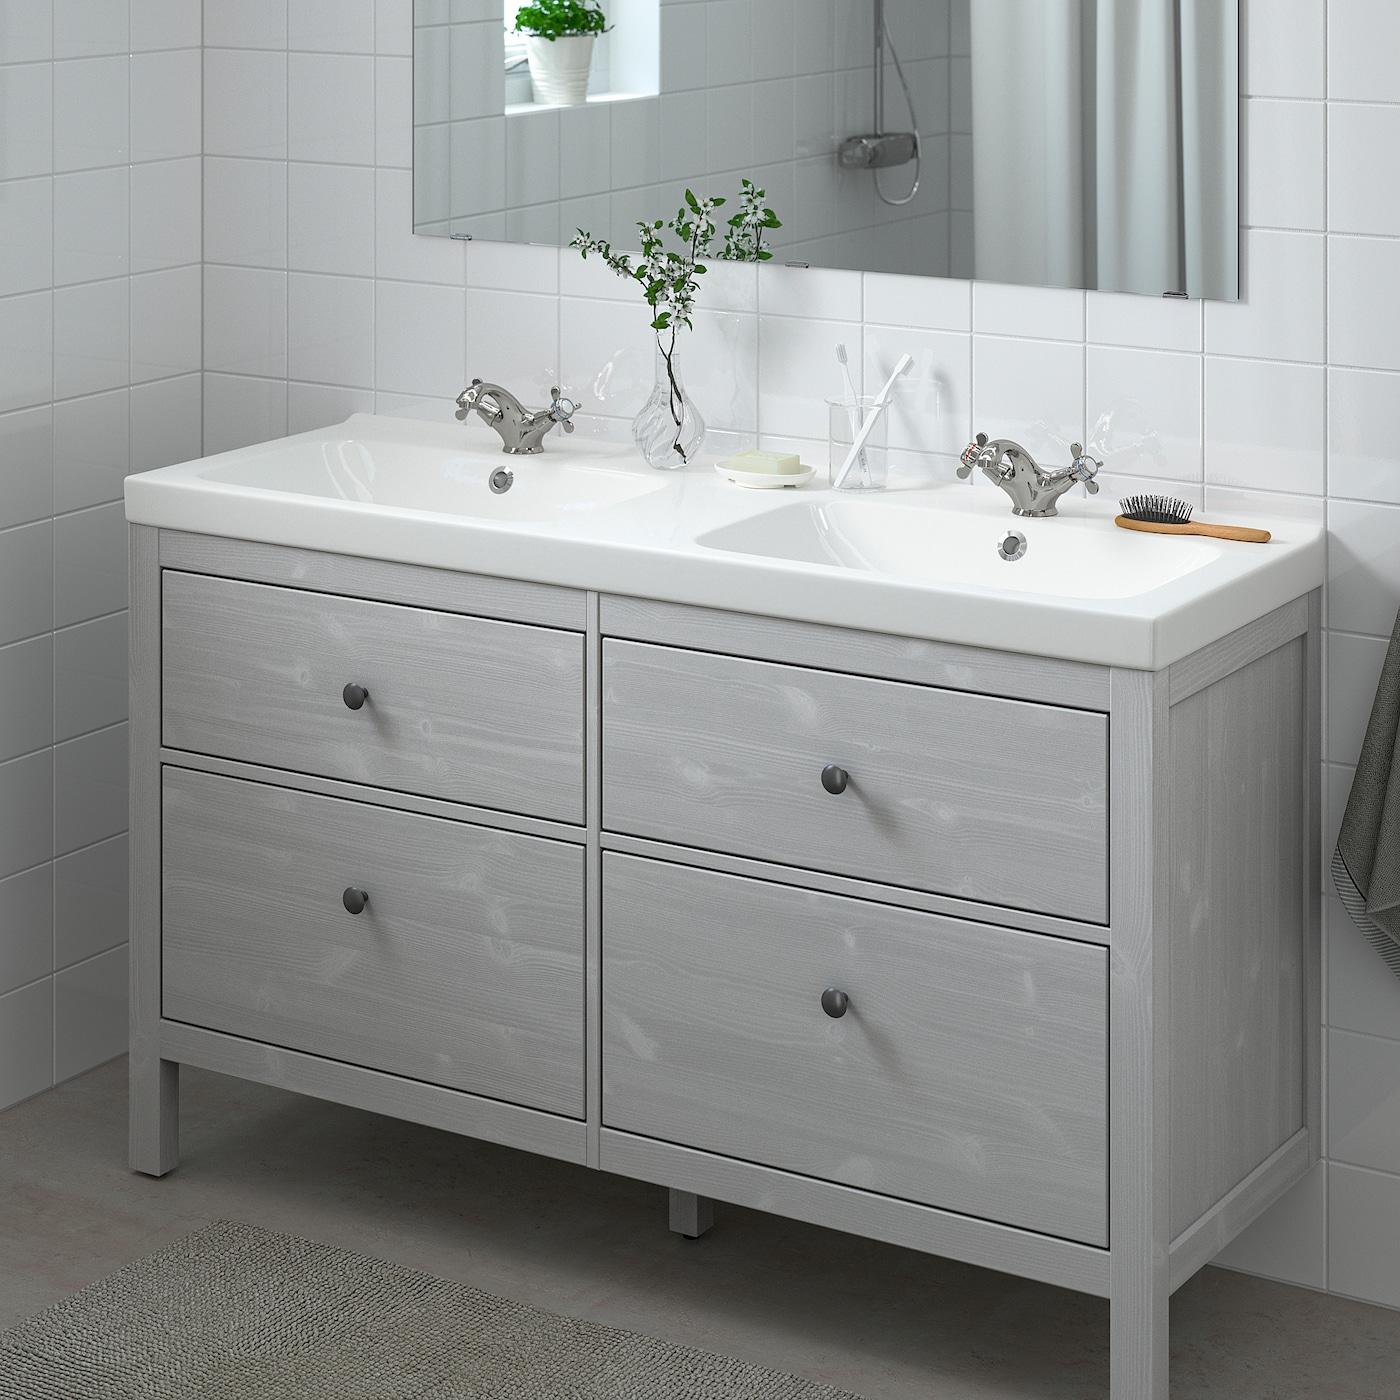 hemnes odensvik bathroom vanity gray runskar faucet 56 1 4x19 1 4x35 143x49x89 cm